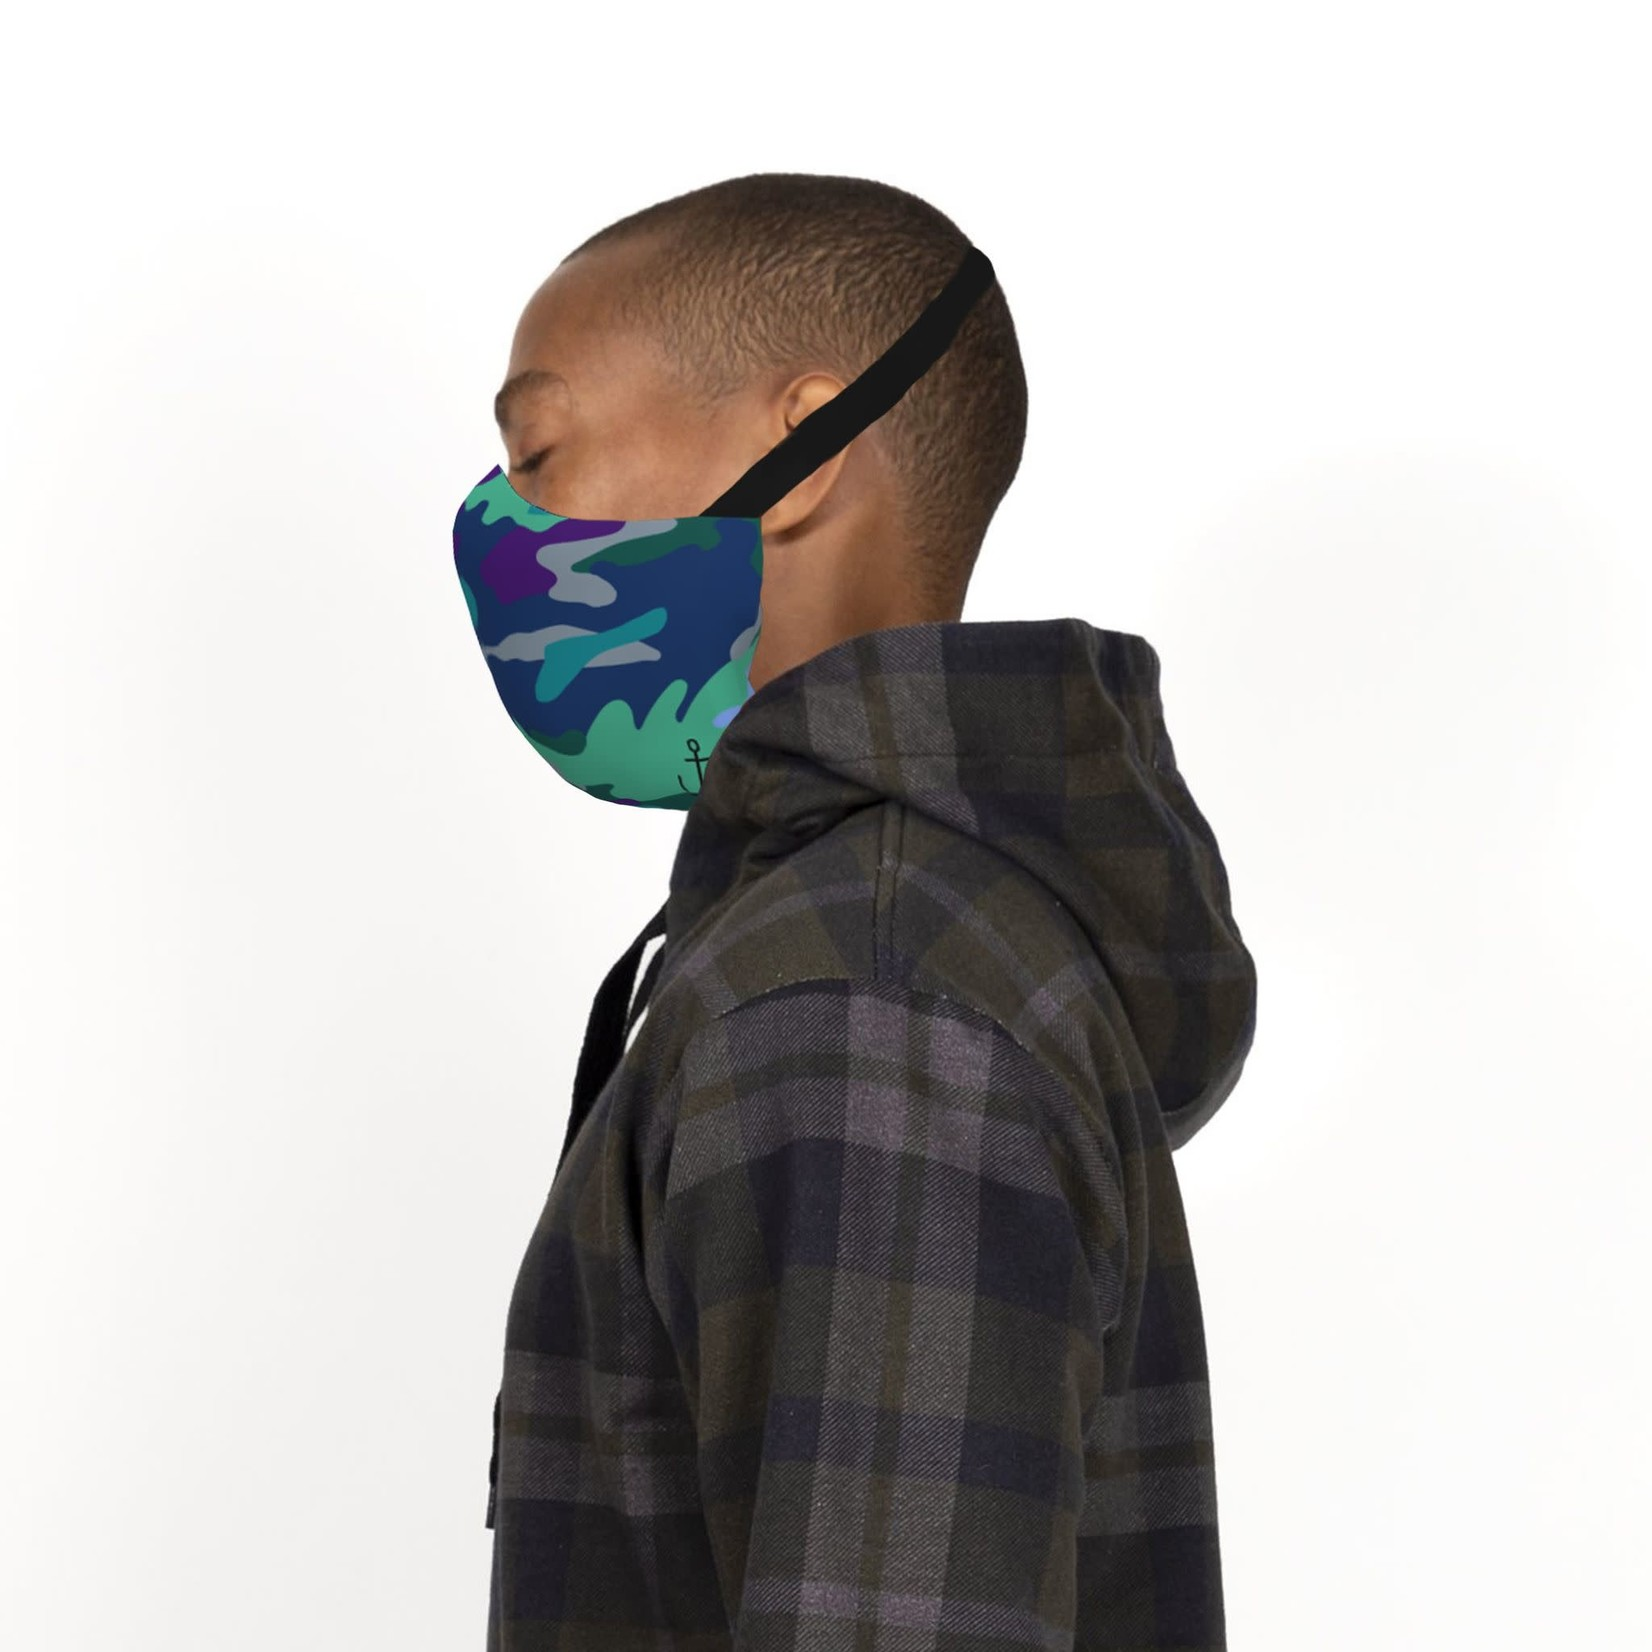 JCRT JCRT The Heroes in Scrubs Camouflage Mask